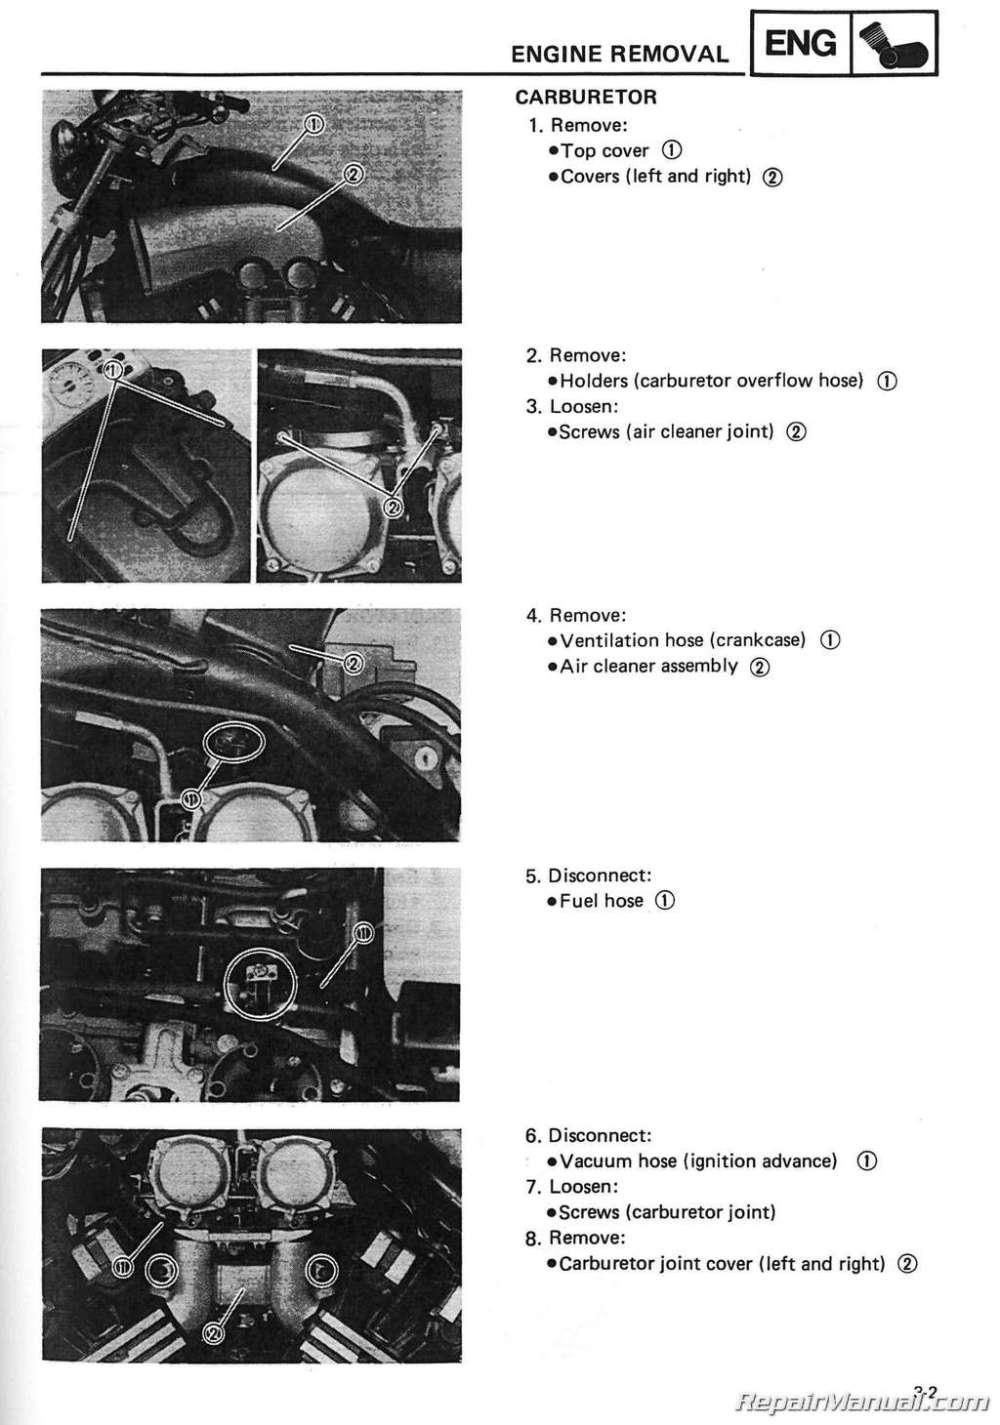 medium resolution of 2000 yamaha motorcycle ignition switch wiring diagram